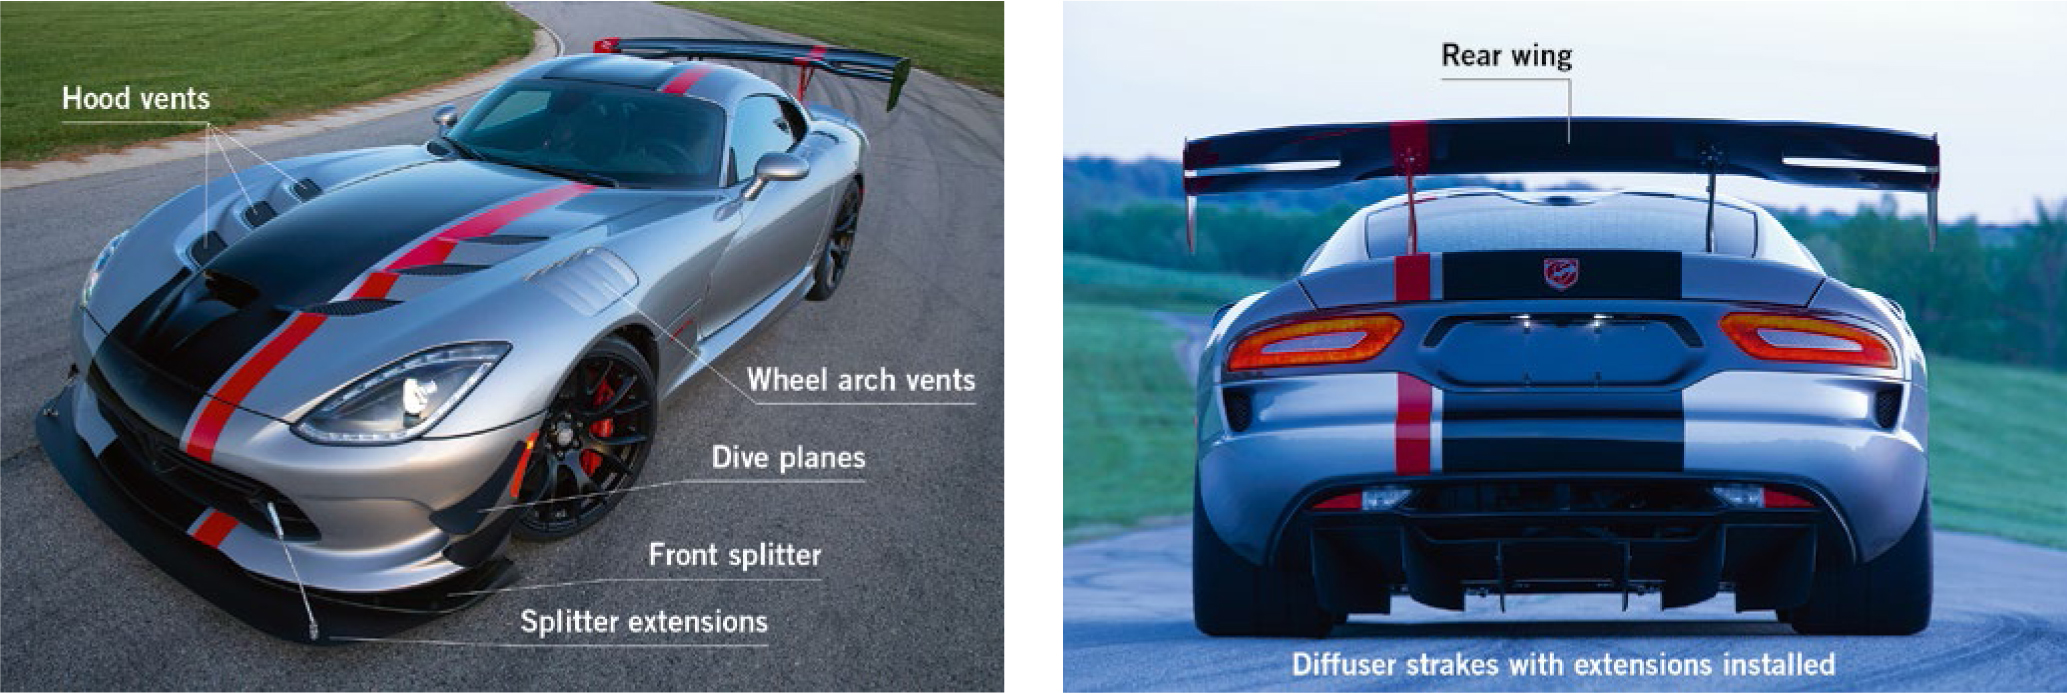 Dodge Viper ACR The Aerodynamics of a Street-legal Race Car